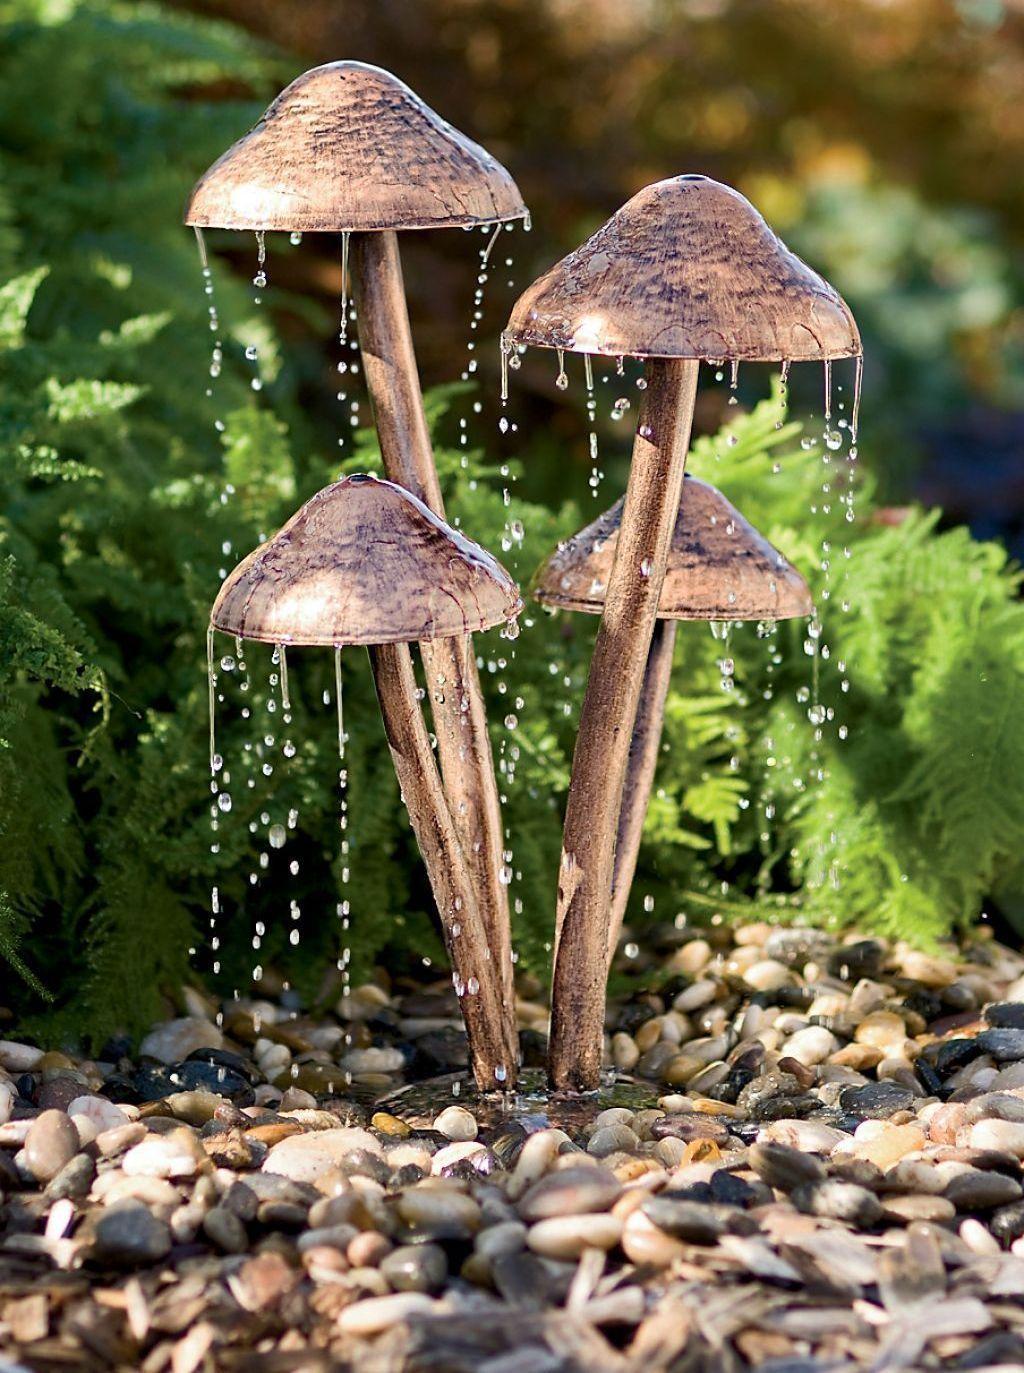 47 Amazing Decorative Garden Fountains Ideas